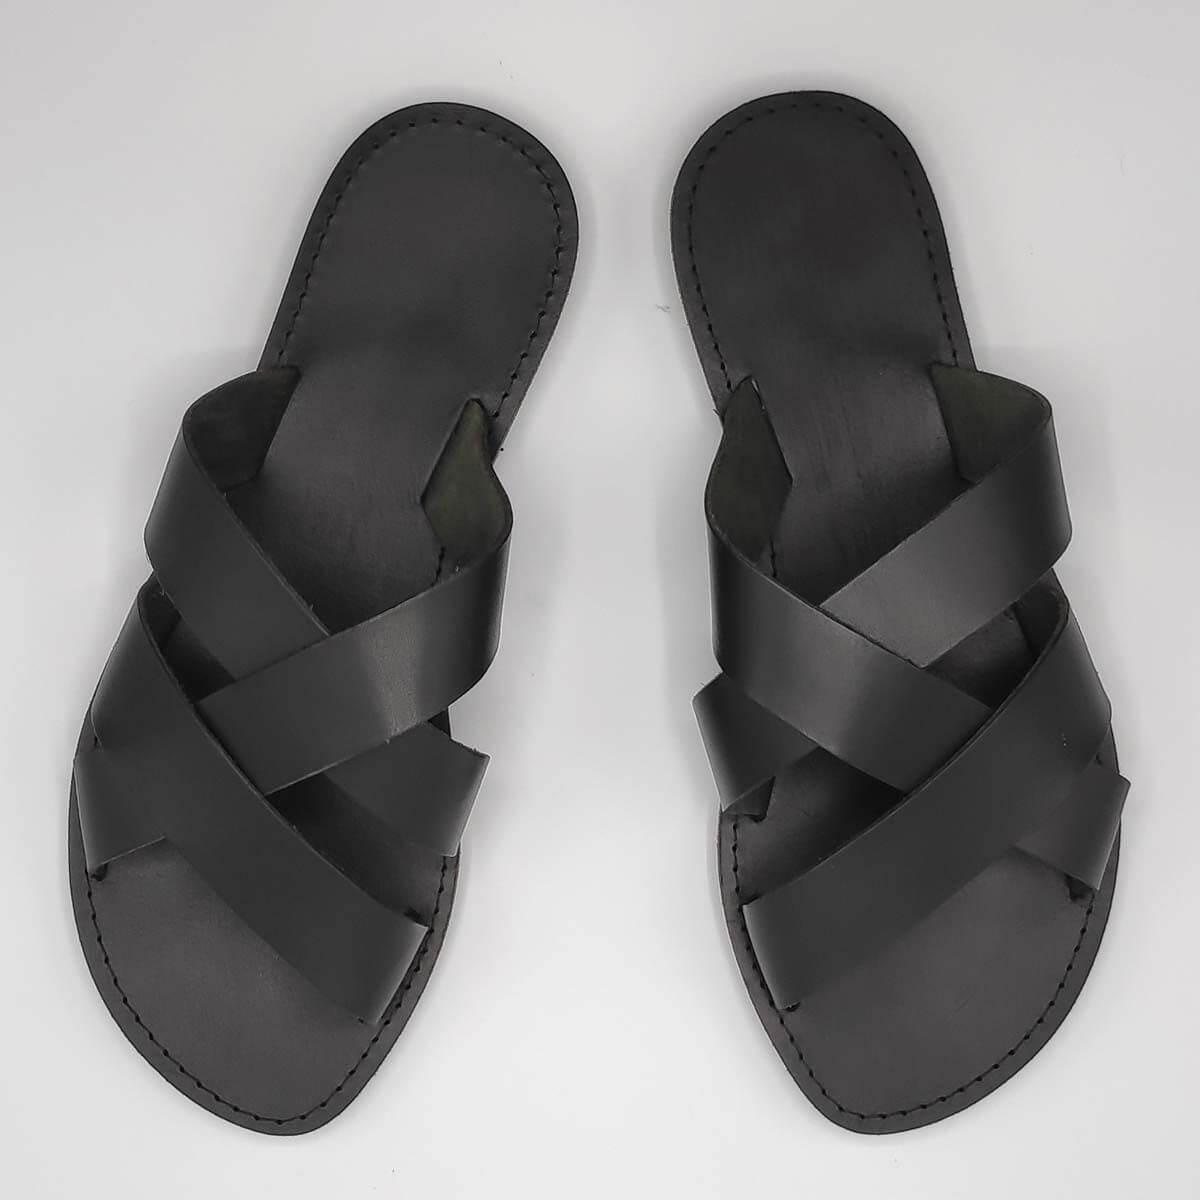 leather sandals for men black three straps criss cross top view - Avithos Men